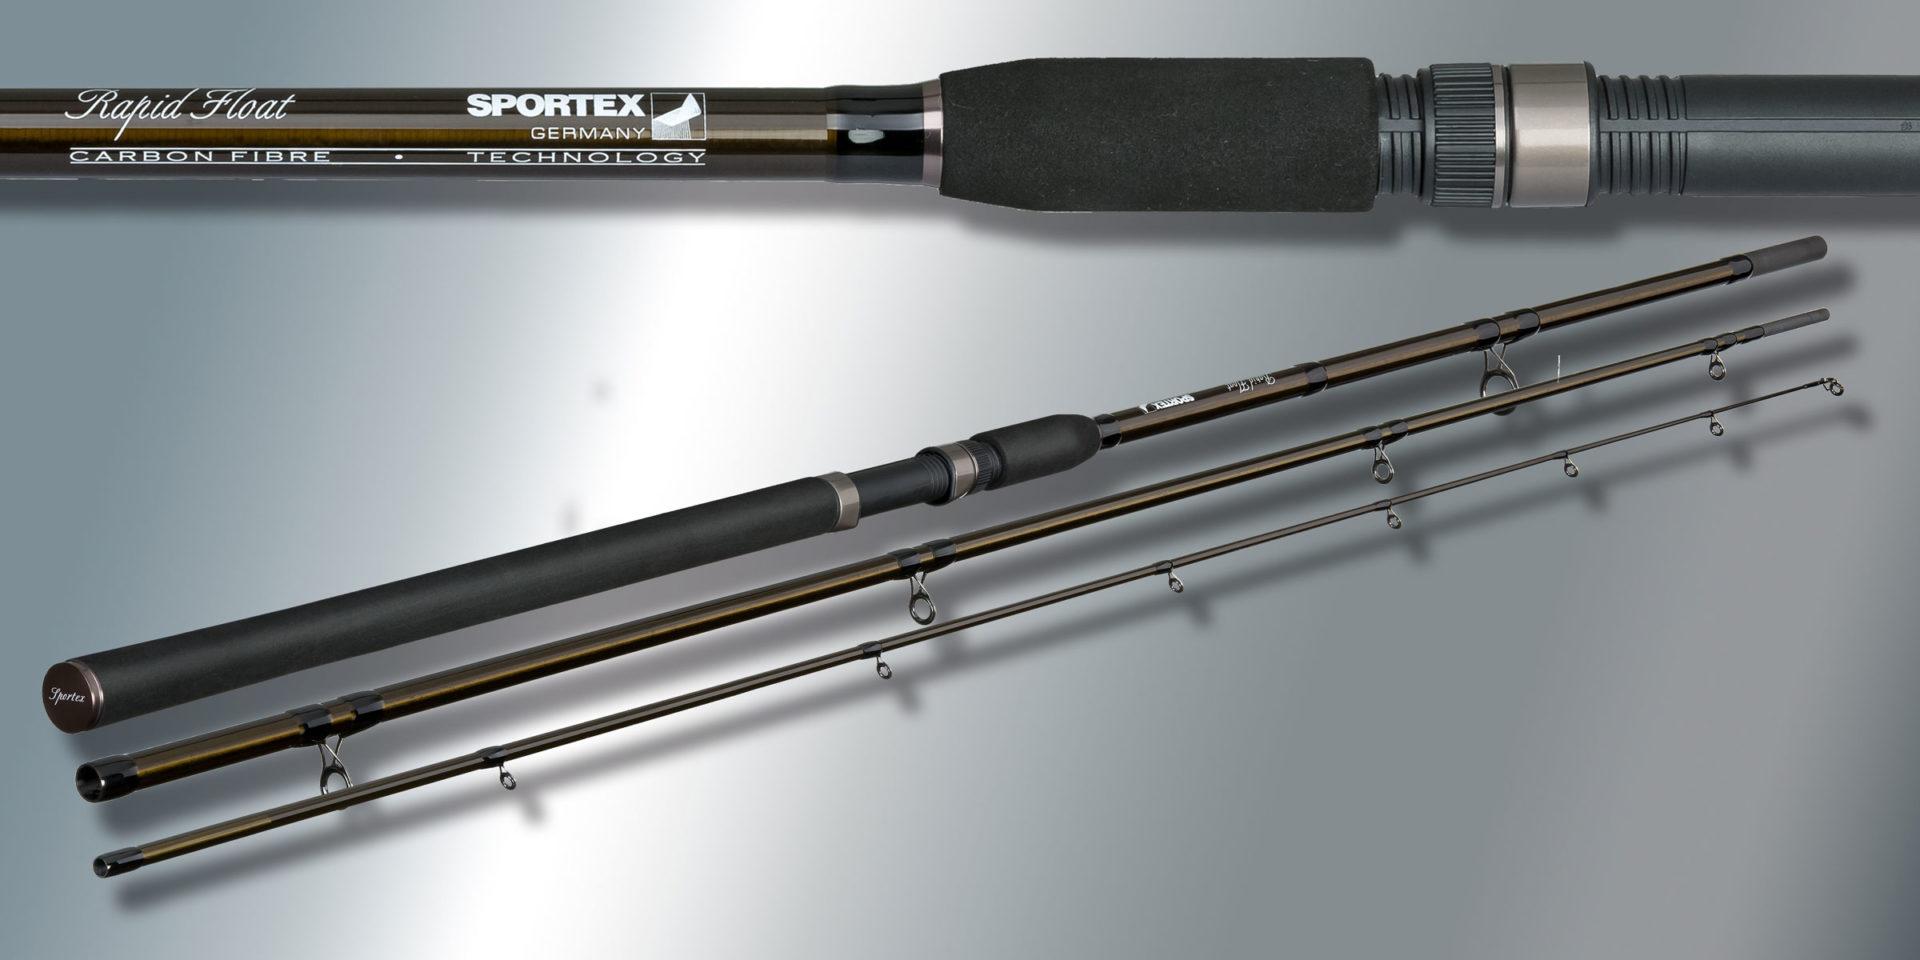 Sportex Rapid Float - Angelrute